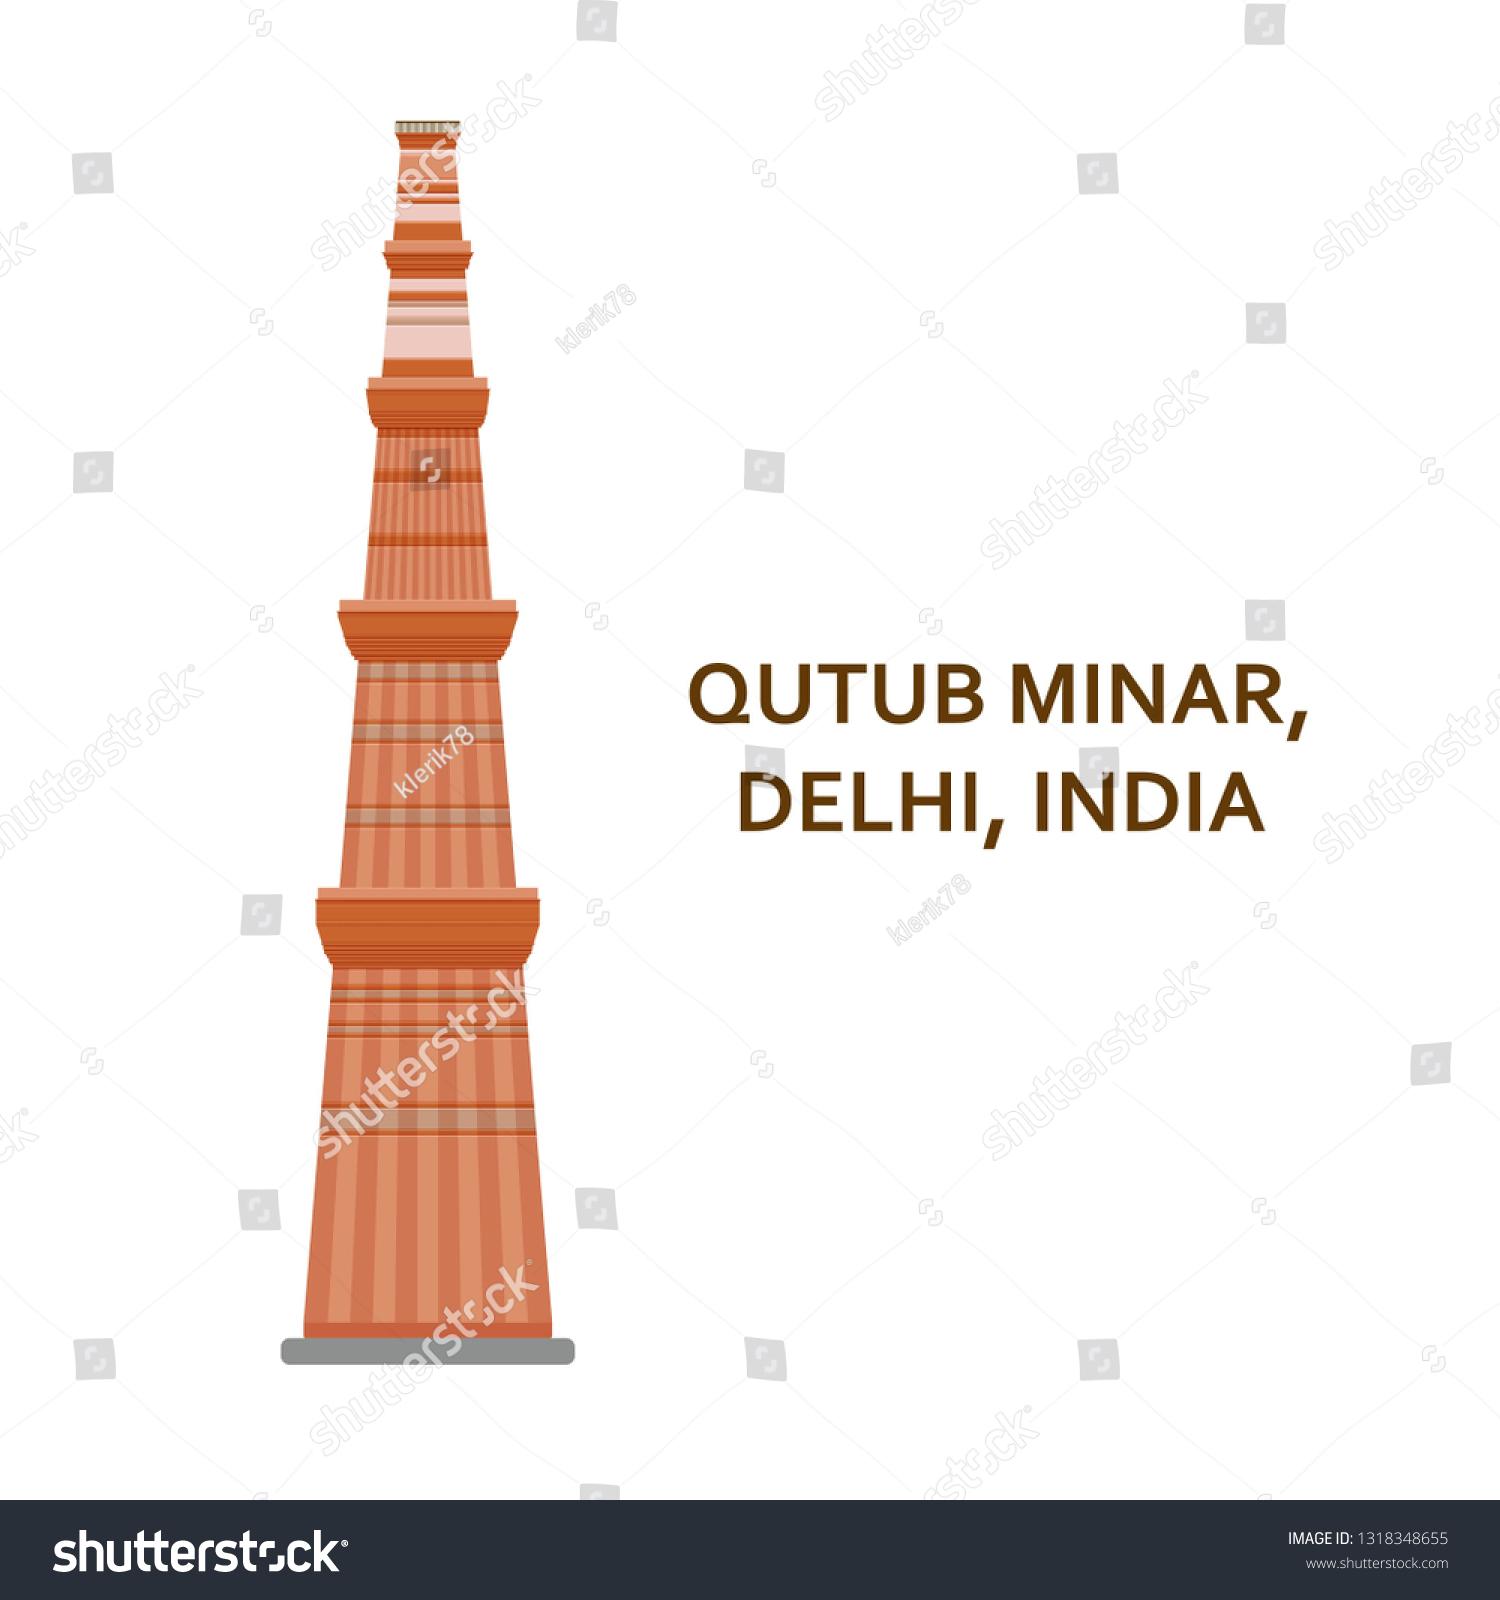 Qutub minar delhi indian most famous sight architectural building famous tourist attractions